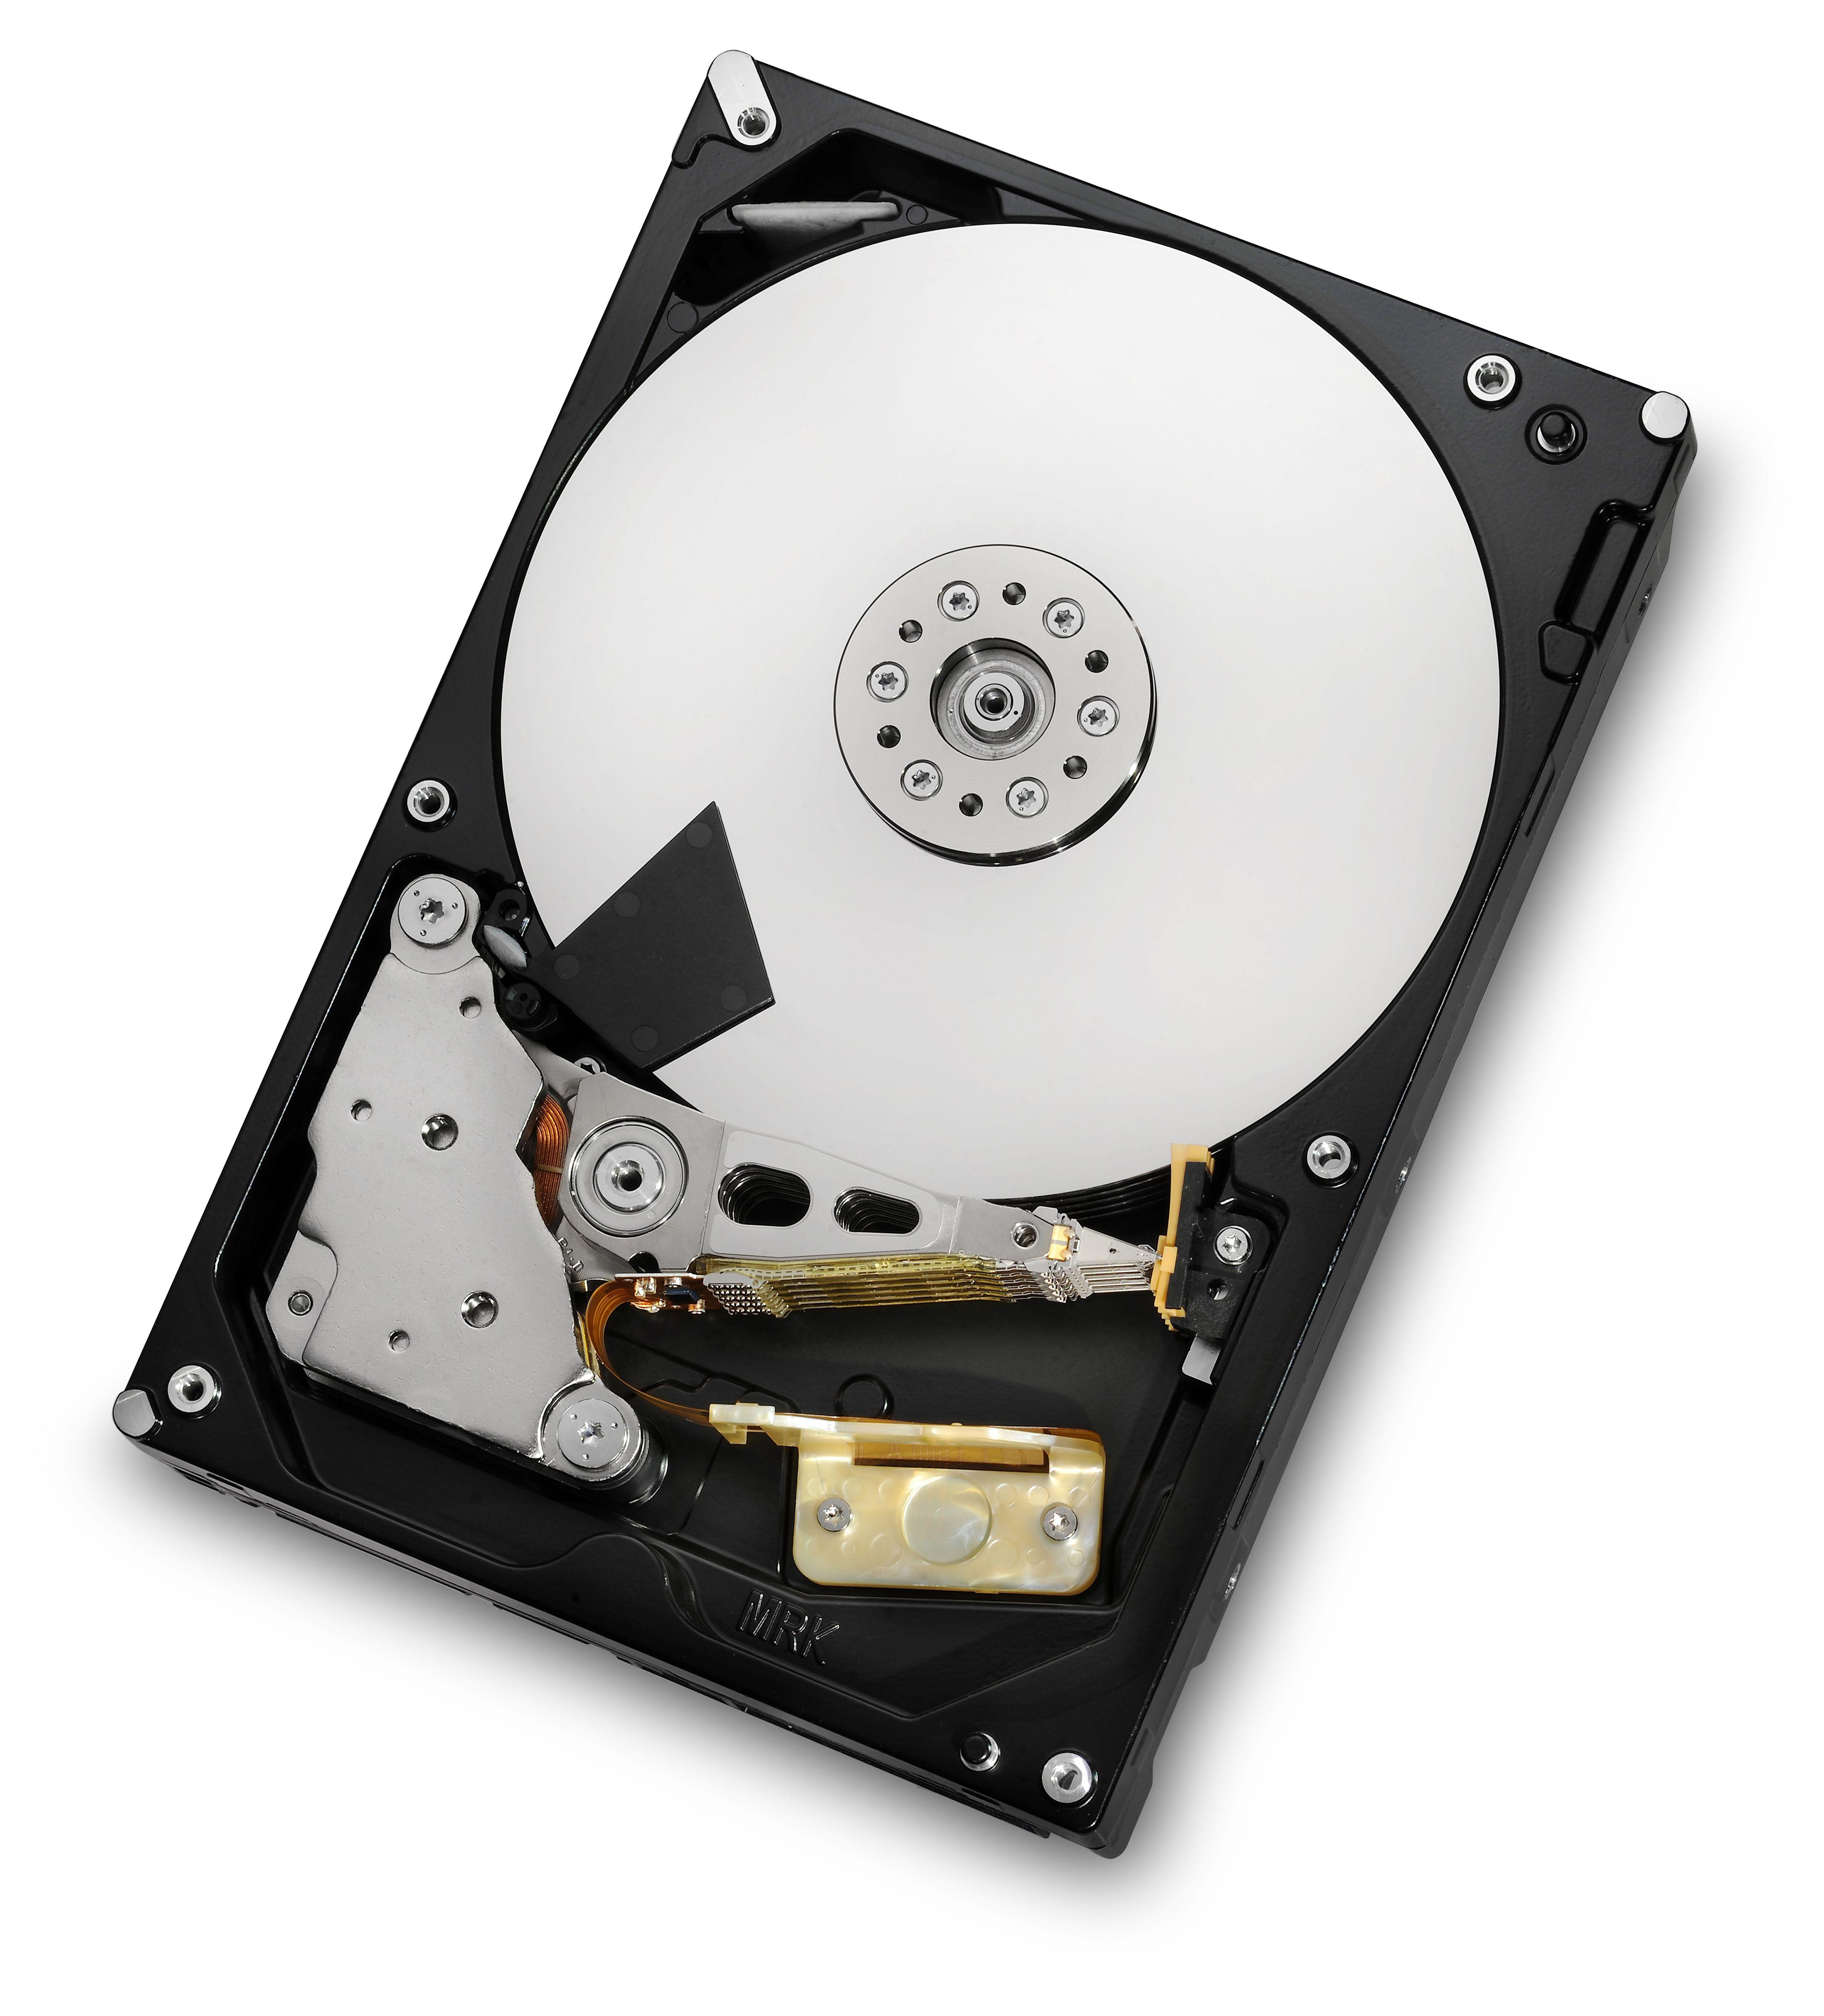 "HGST Deskstar ™ 5K3000 3,5"" Festplatte 2 TB für 50,98€ (Real)"